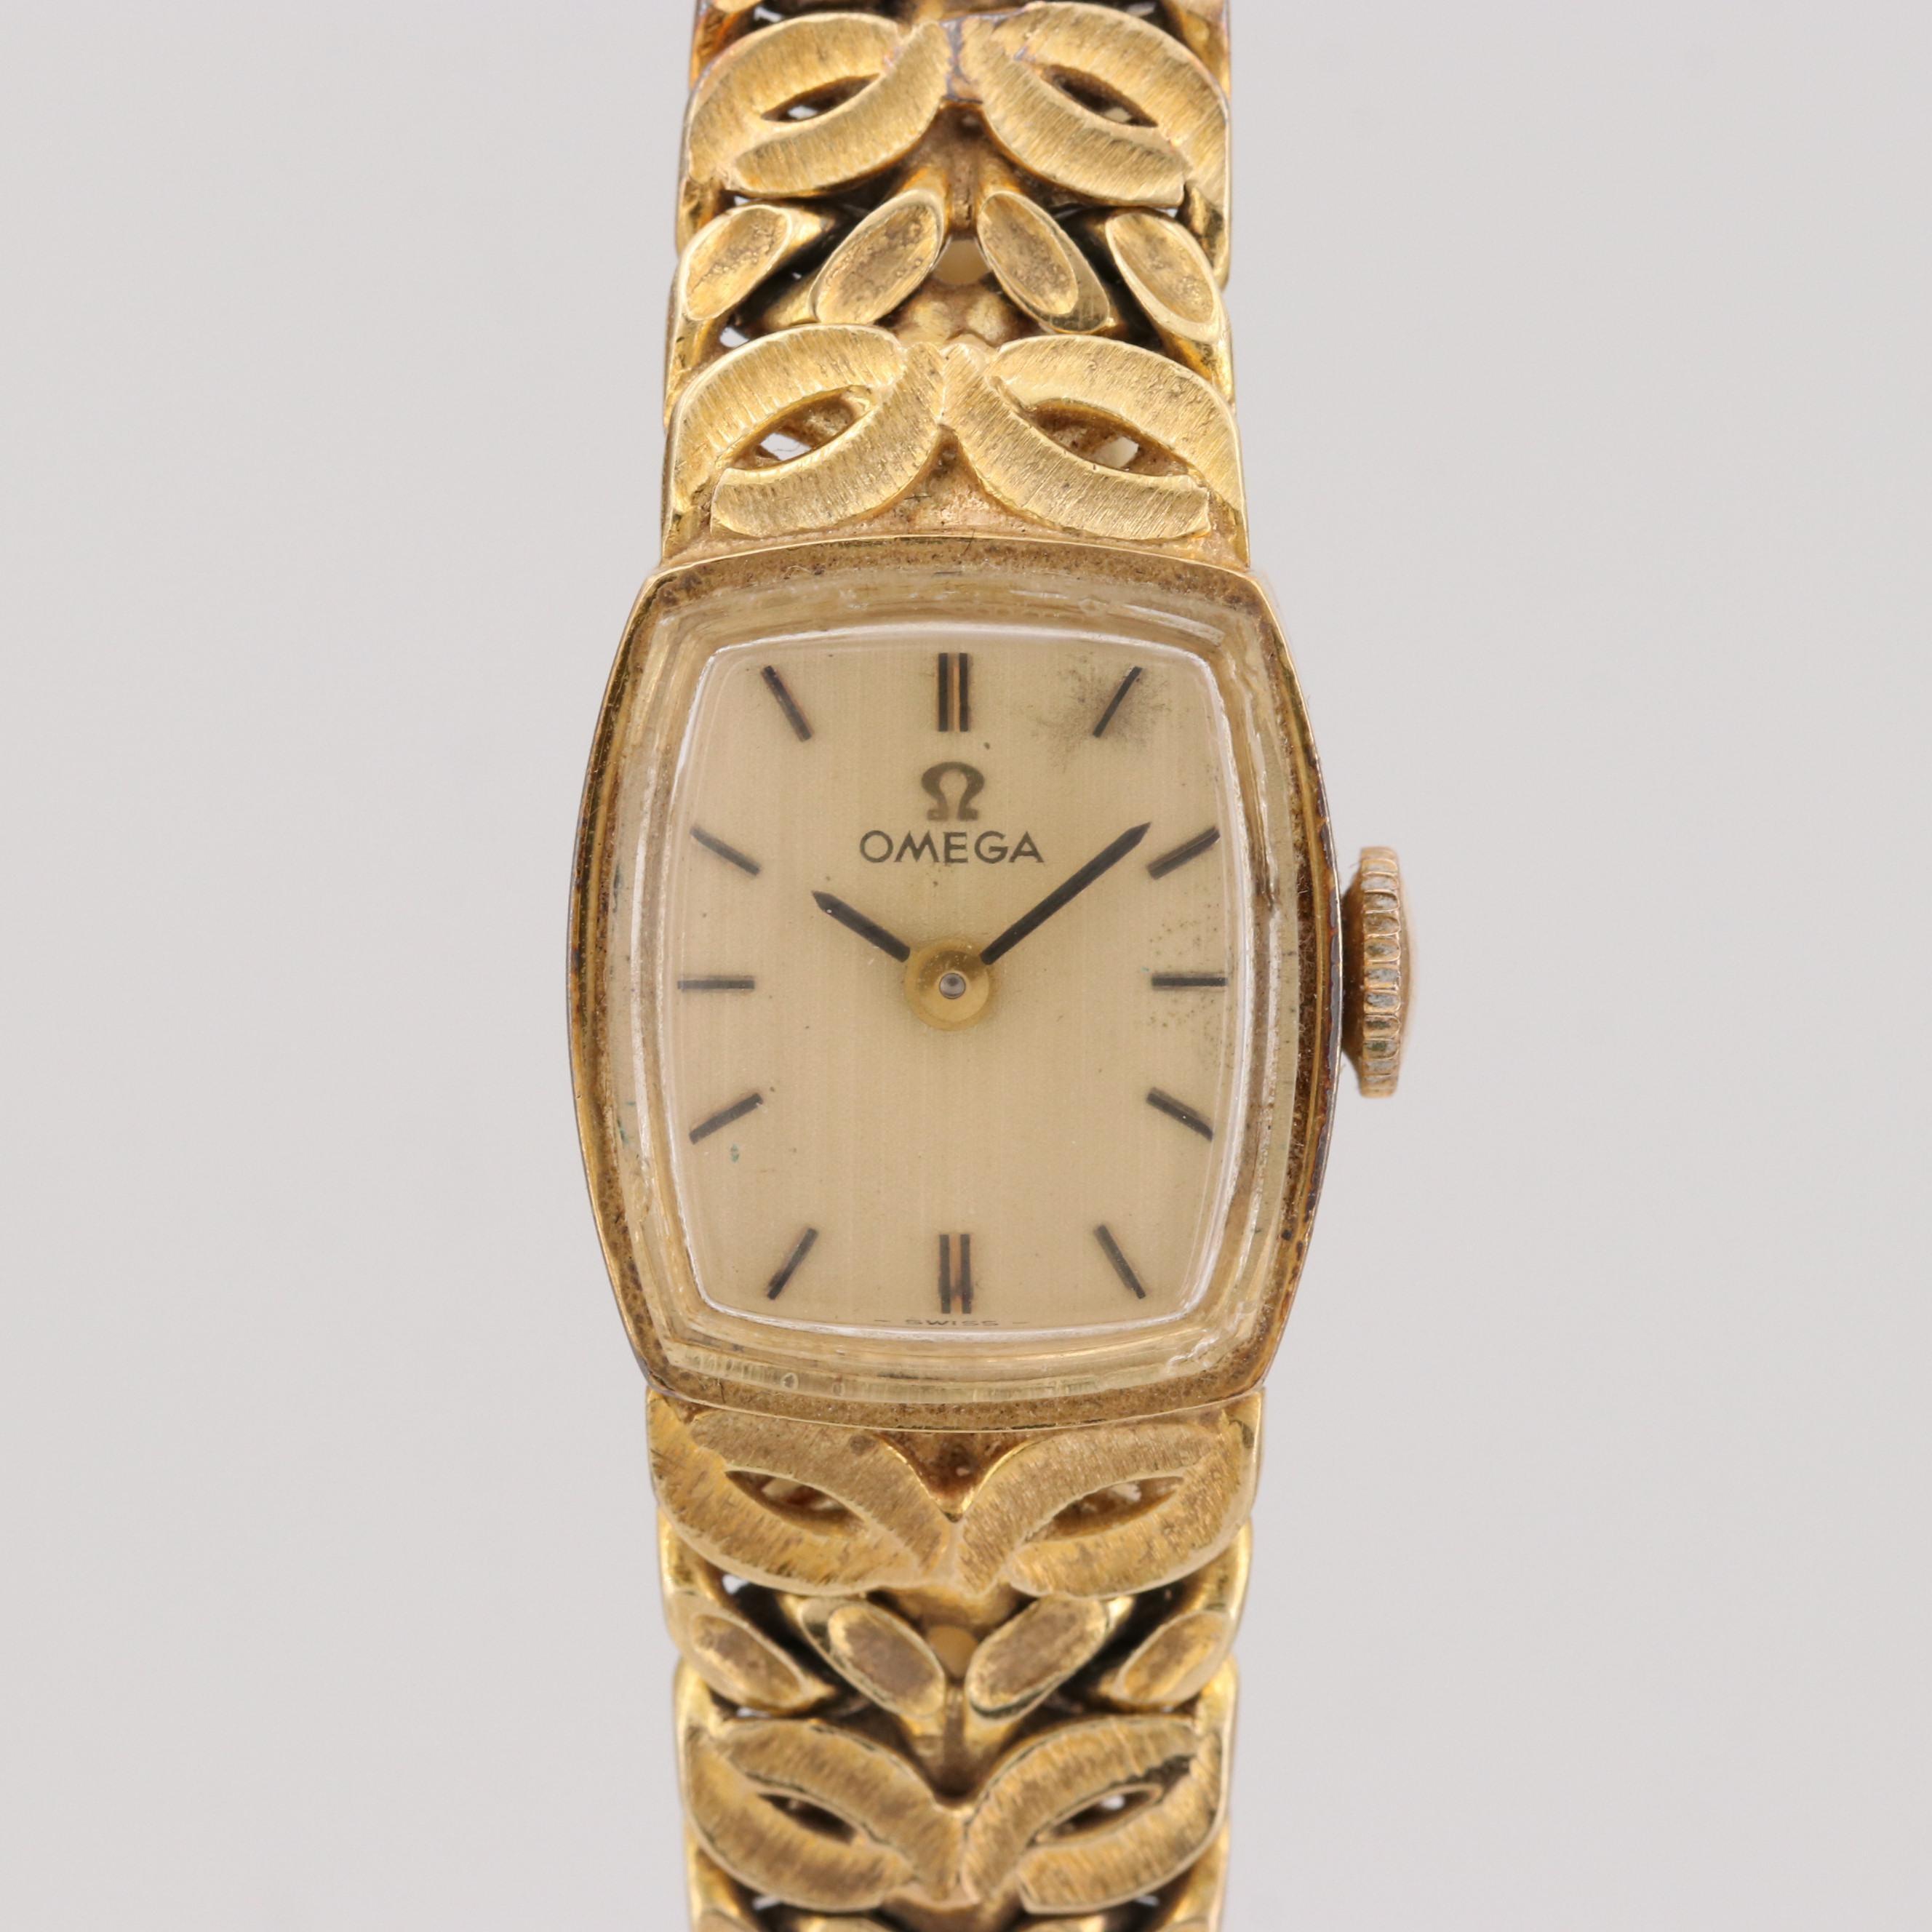 Omega 14K Yellow Gold Seventeen Jewel Wristwatch